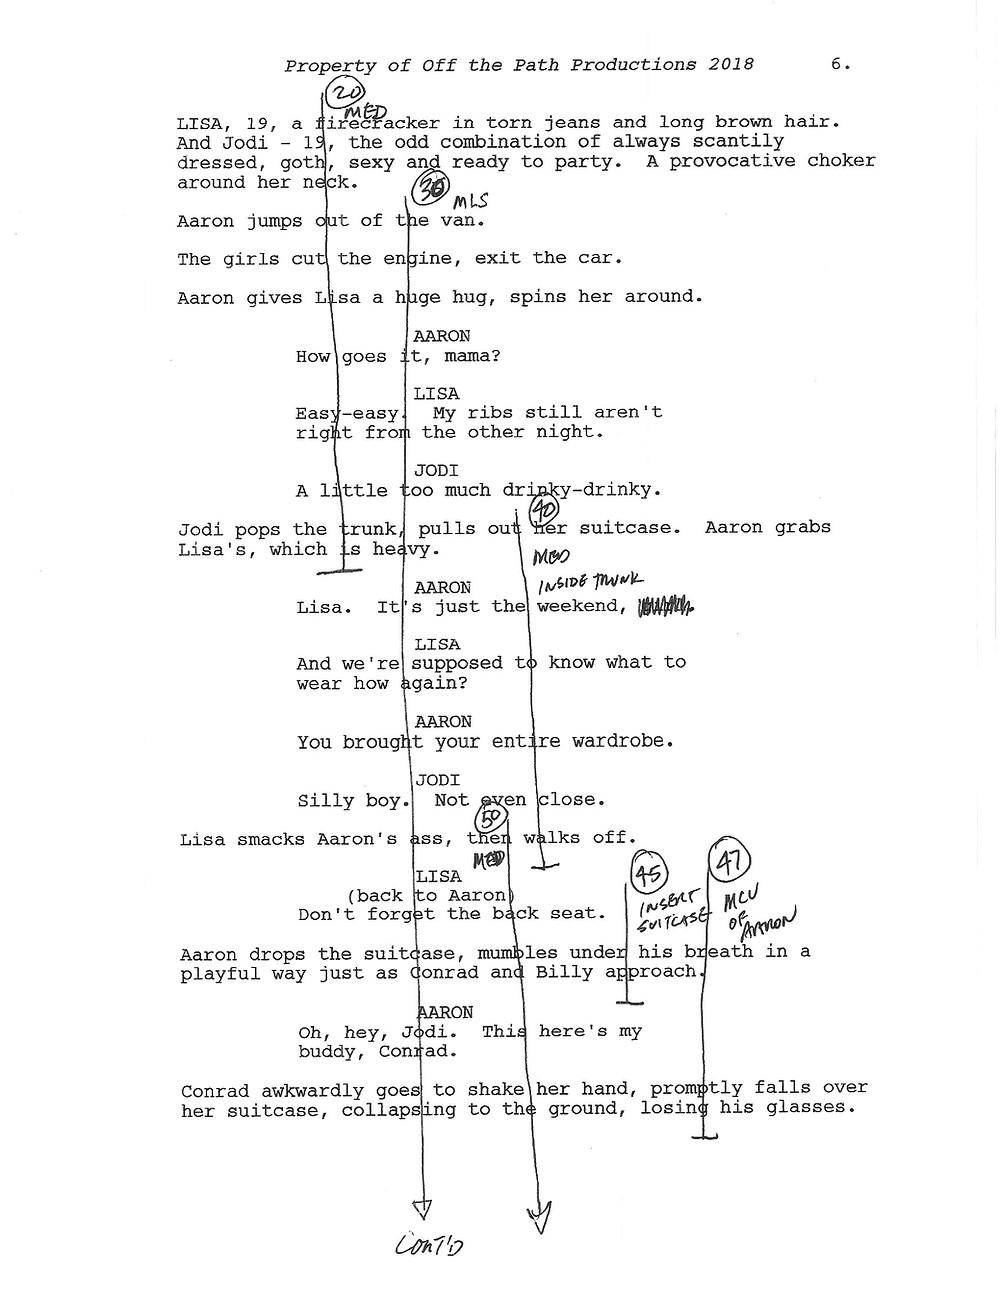 Marked up film script